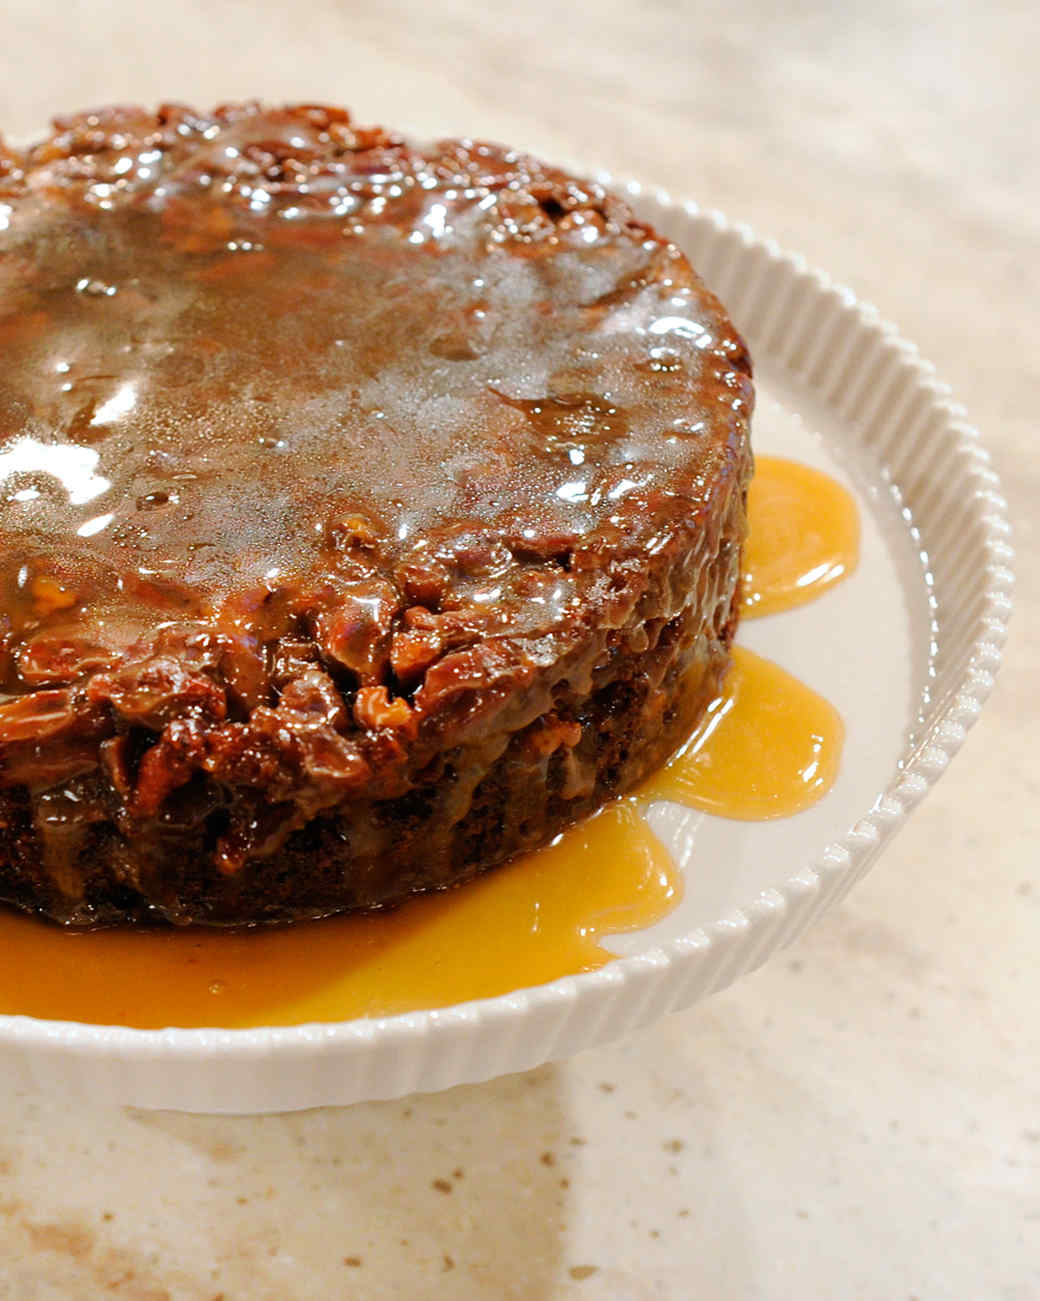 sticky-toffee-pudding-mslb7025.jpg